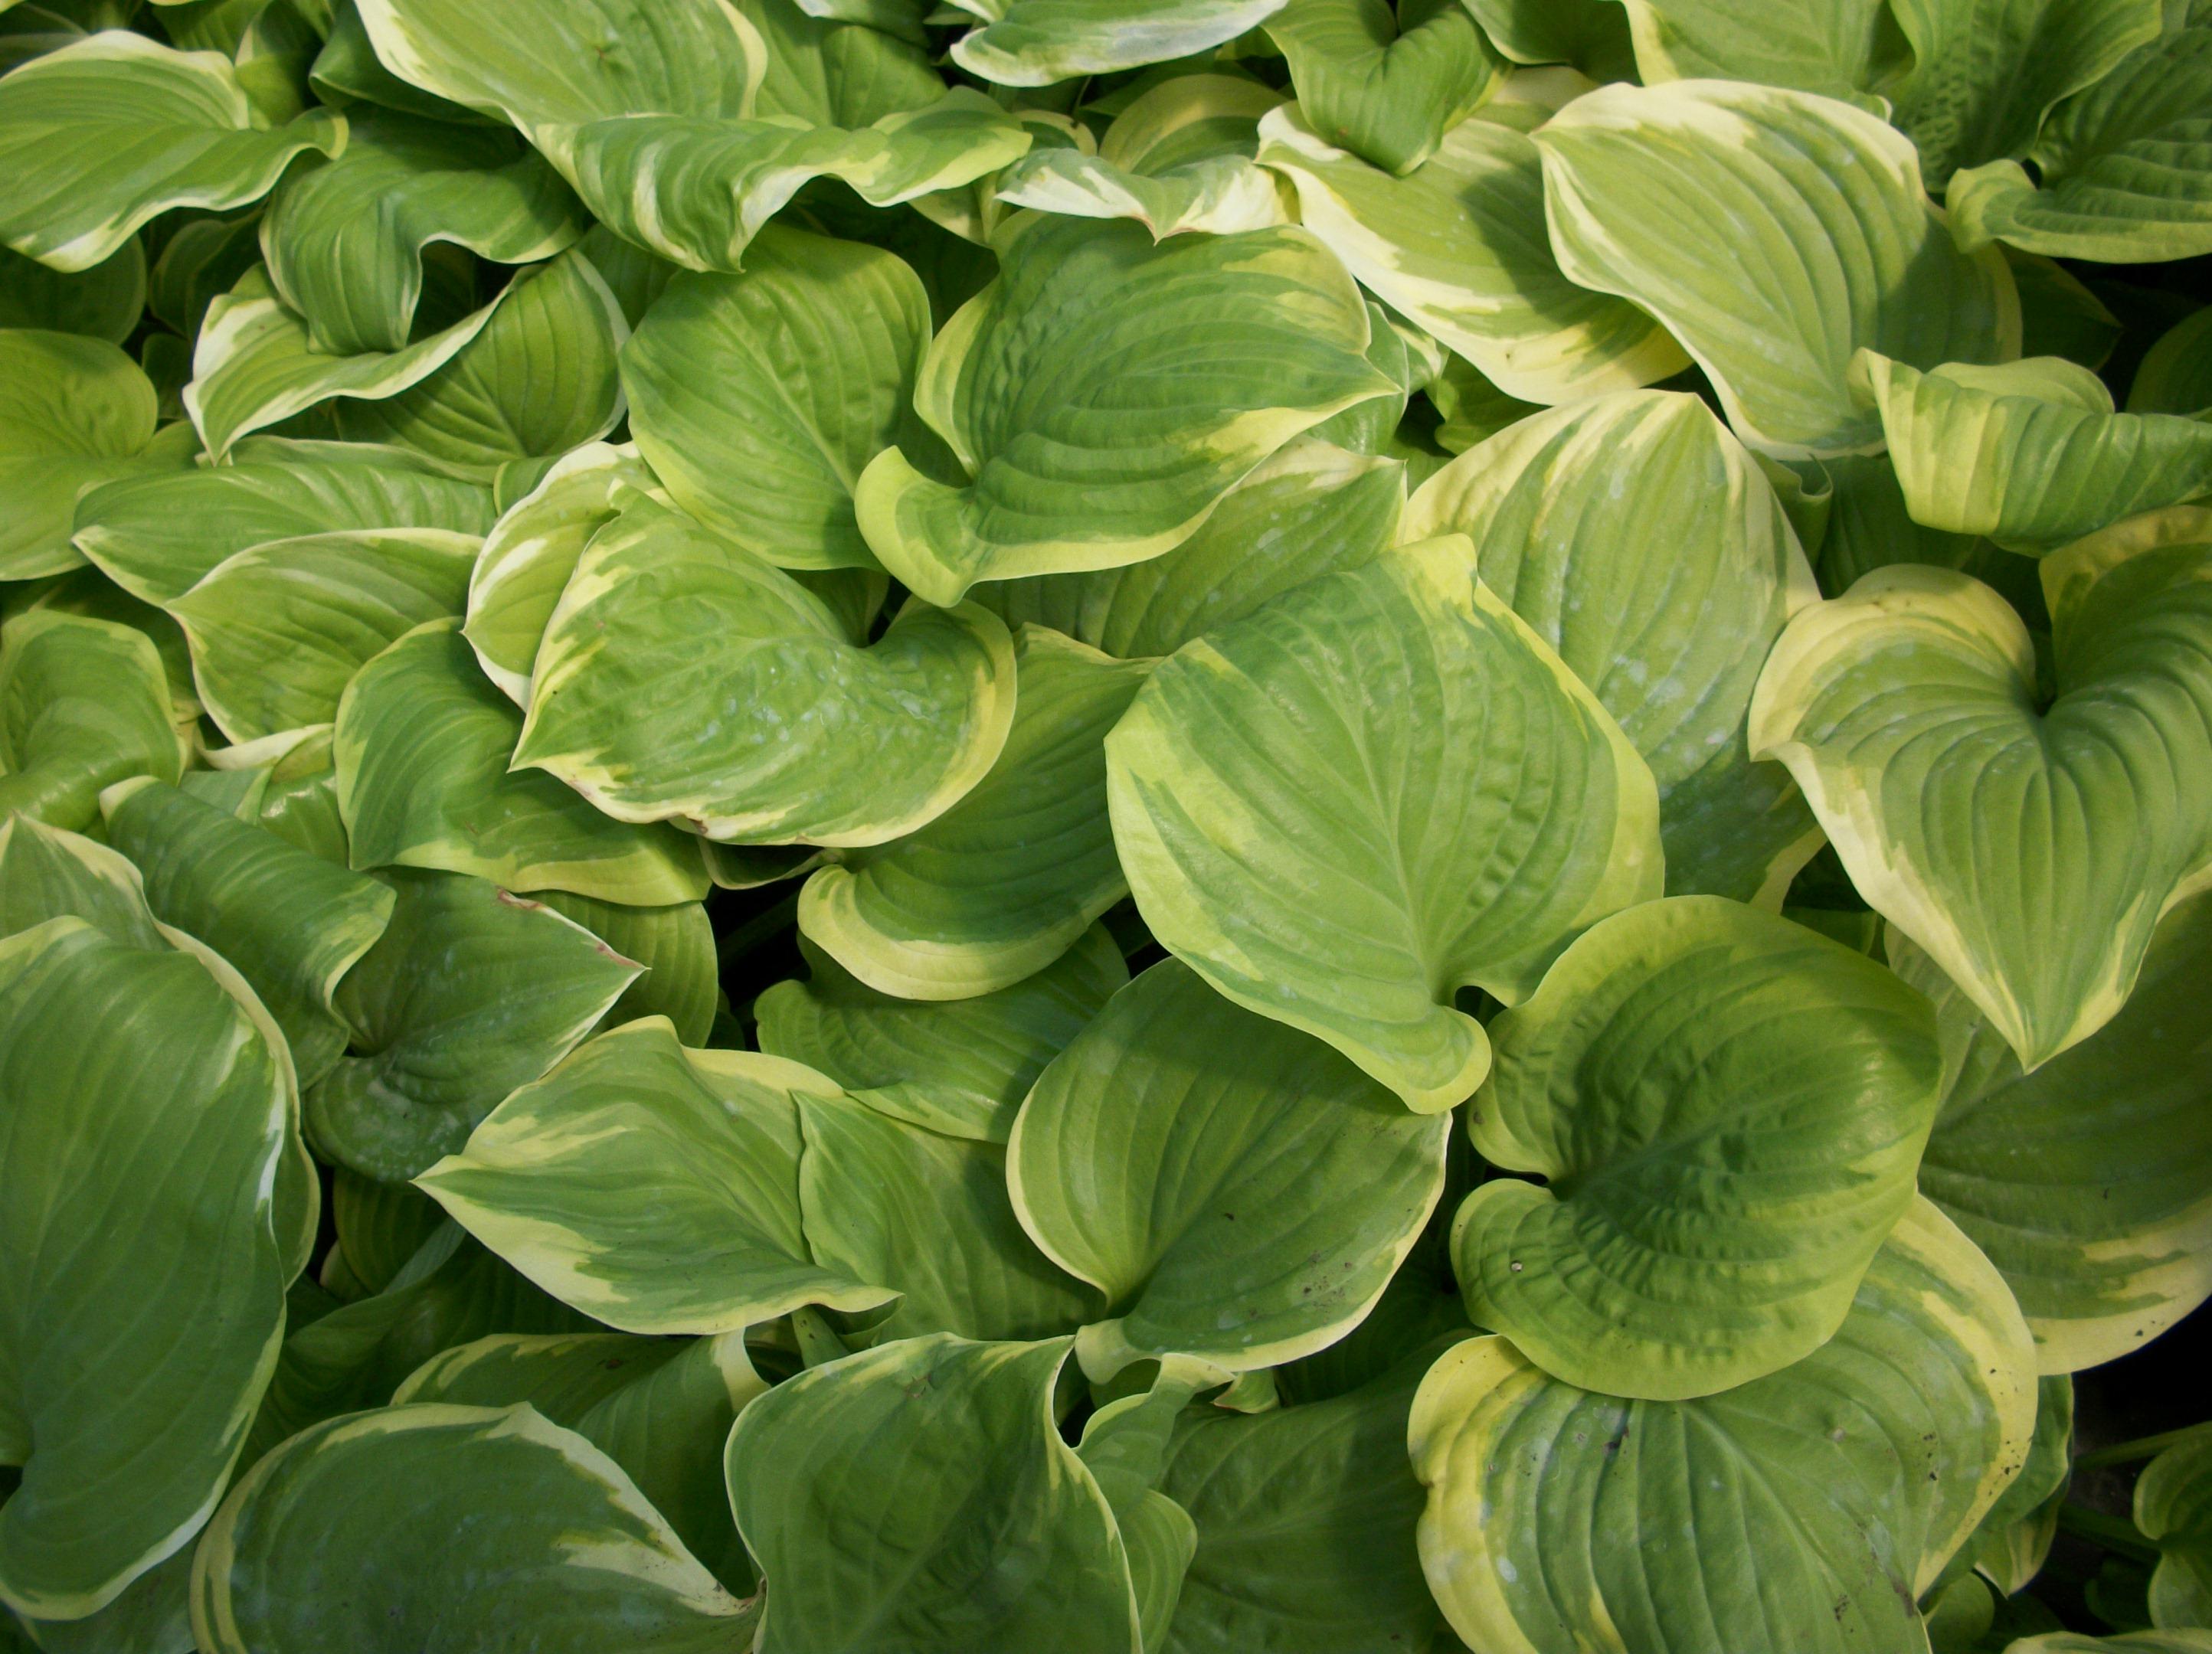 Premier plant solutions fragrant bouquet plantain lily izmirmasajfo